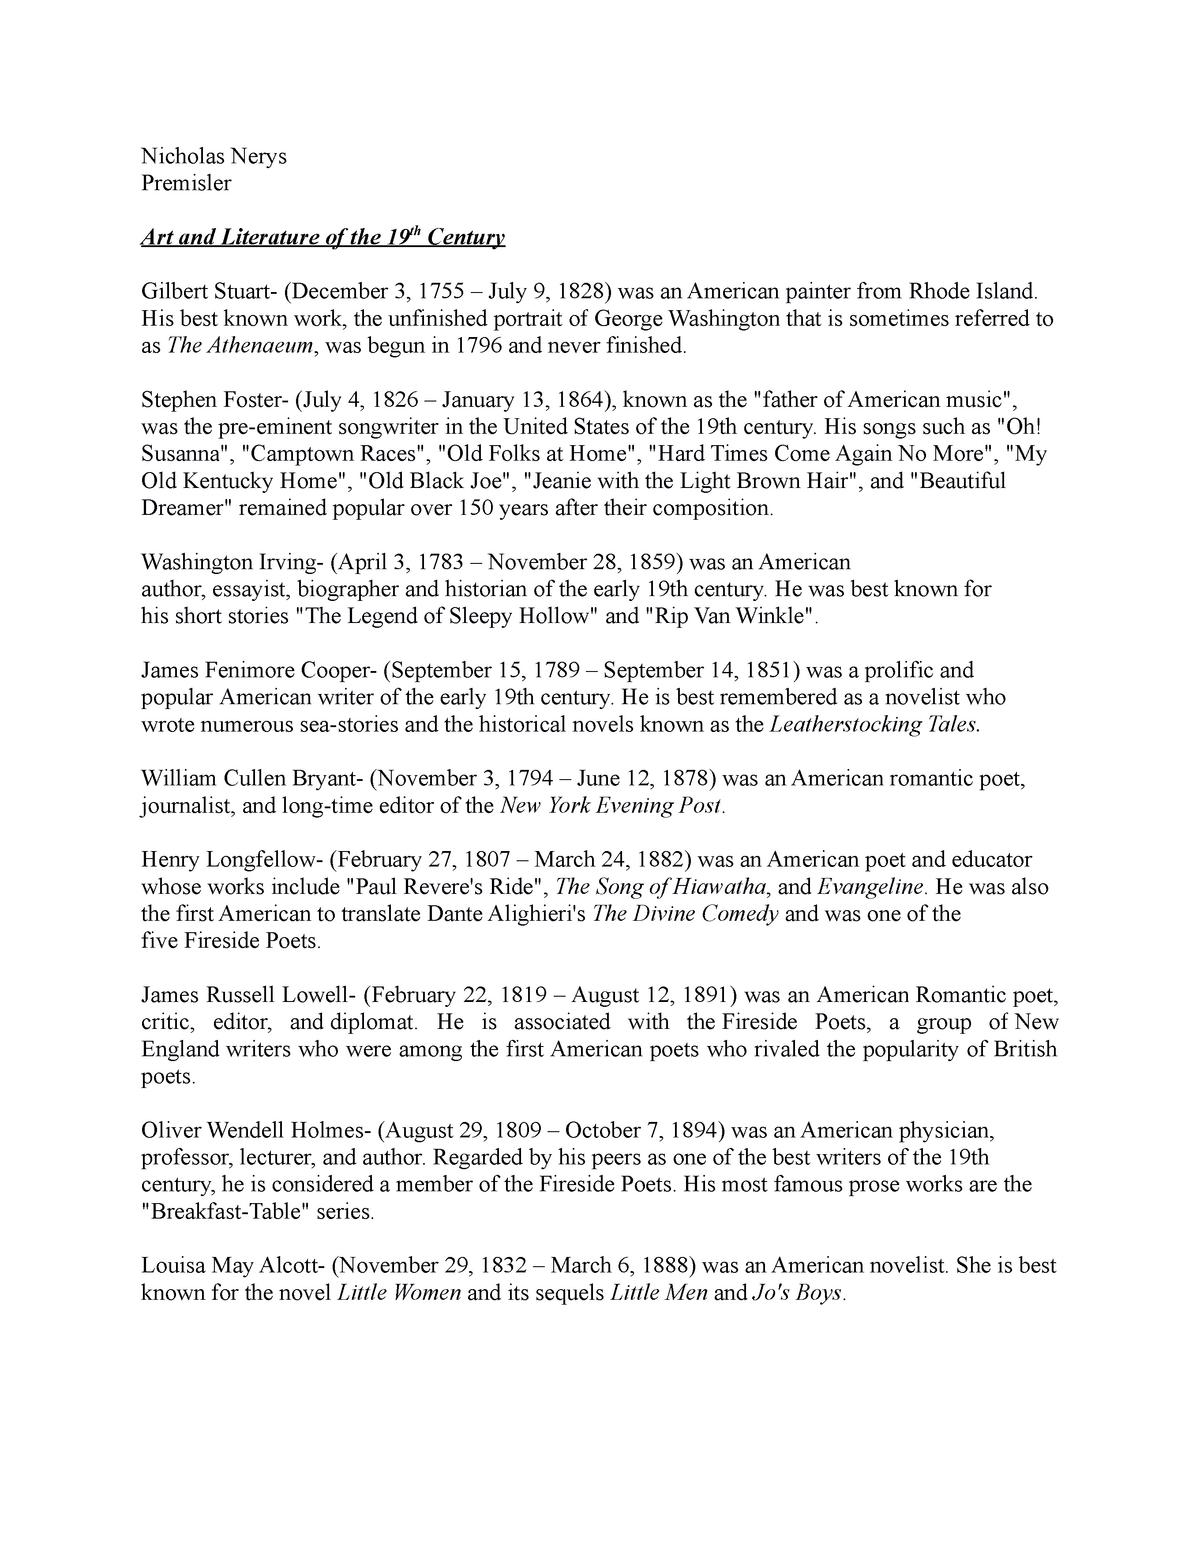 American Literature of the 19th Century - POL 1101: American